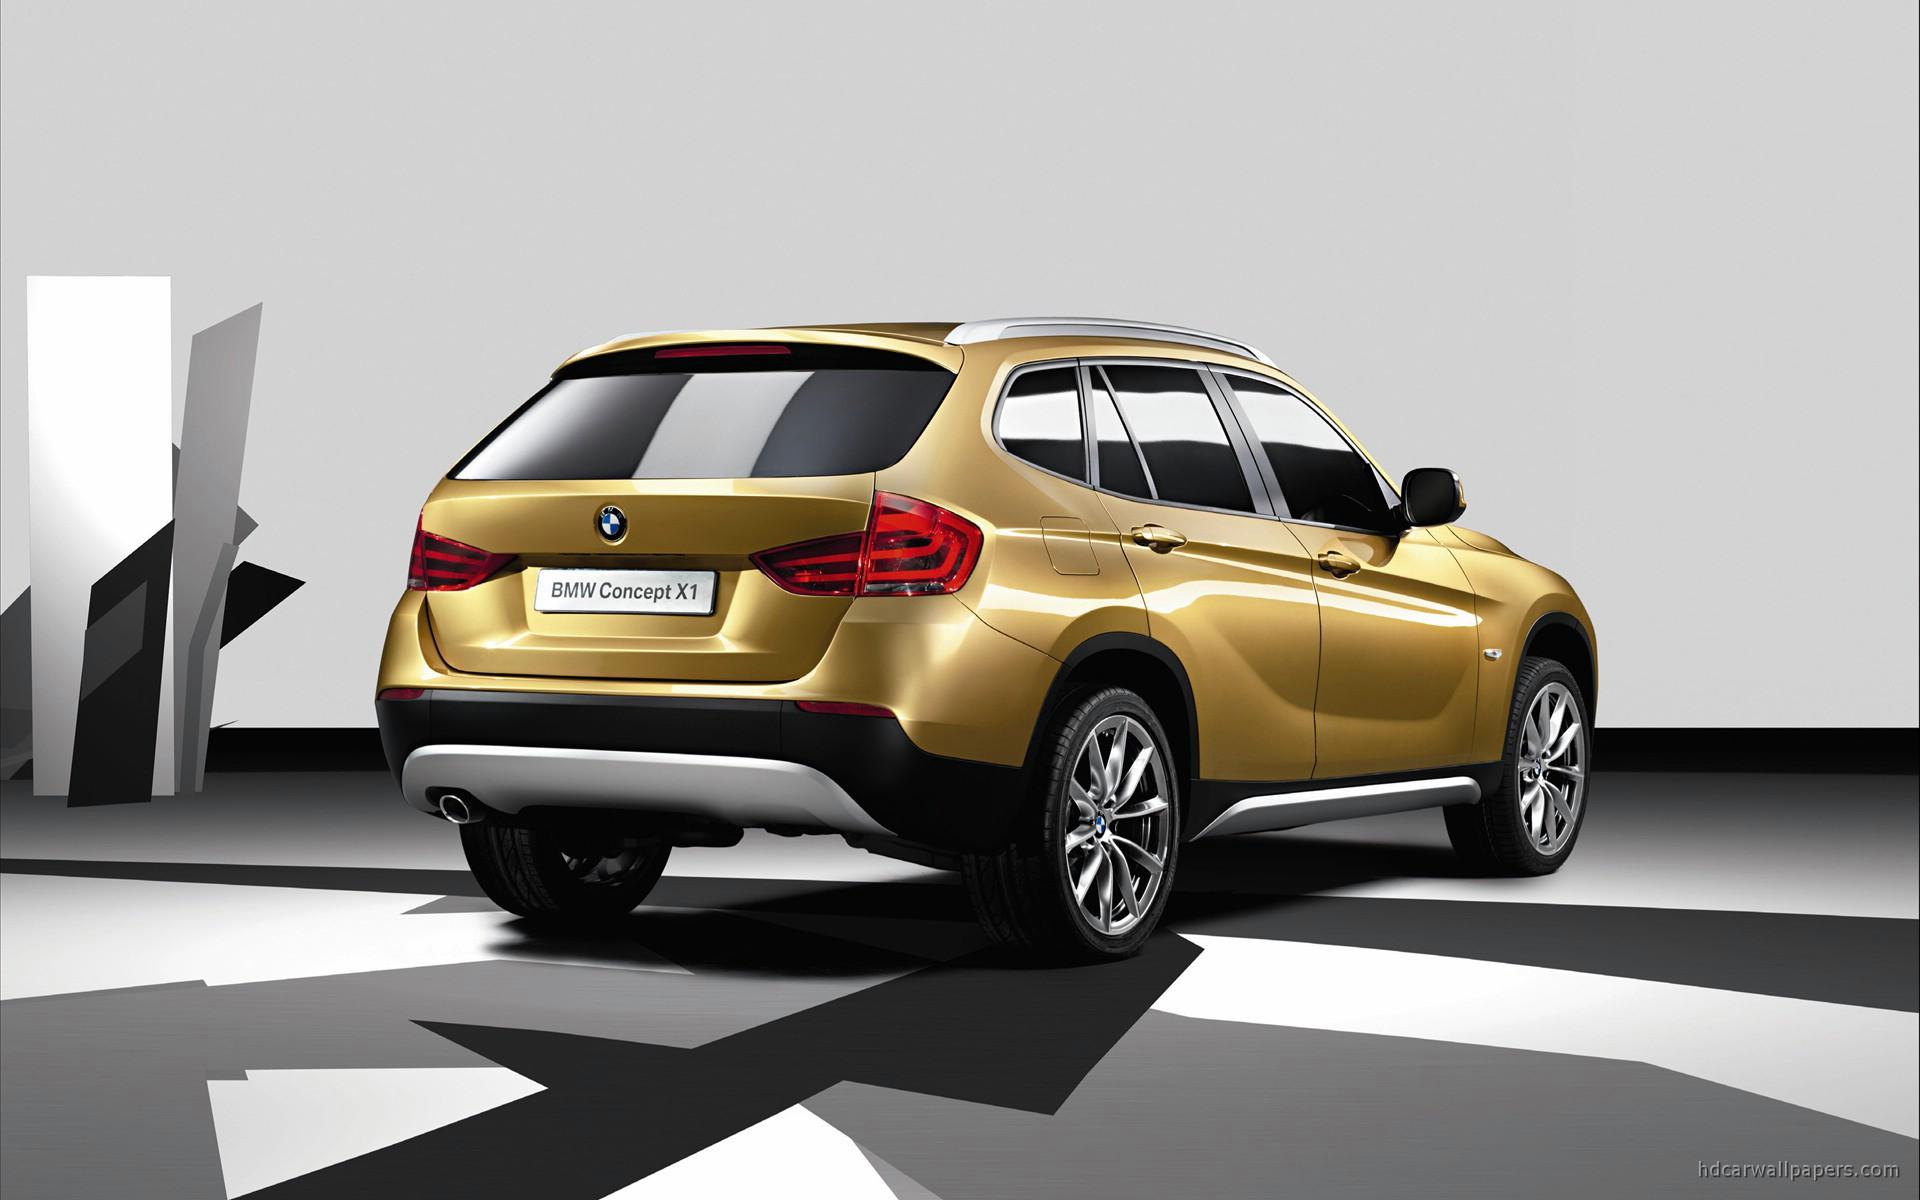 BMW X1 Concept 2 Wallpaper | HD Car Wallpapers | ID #295